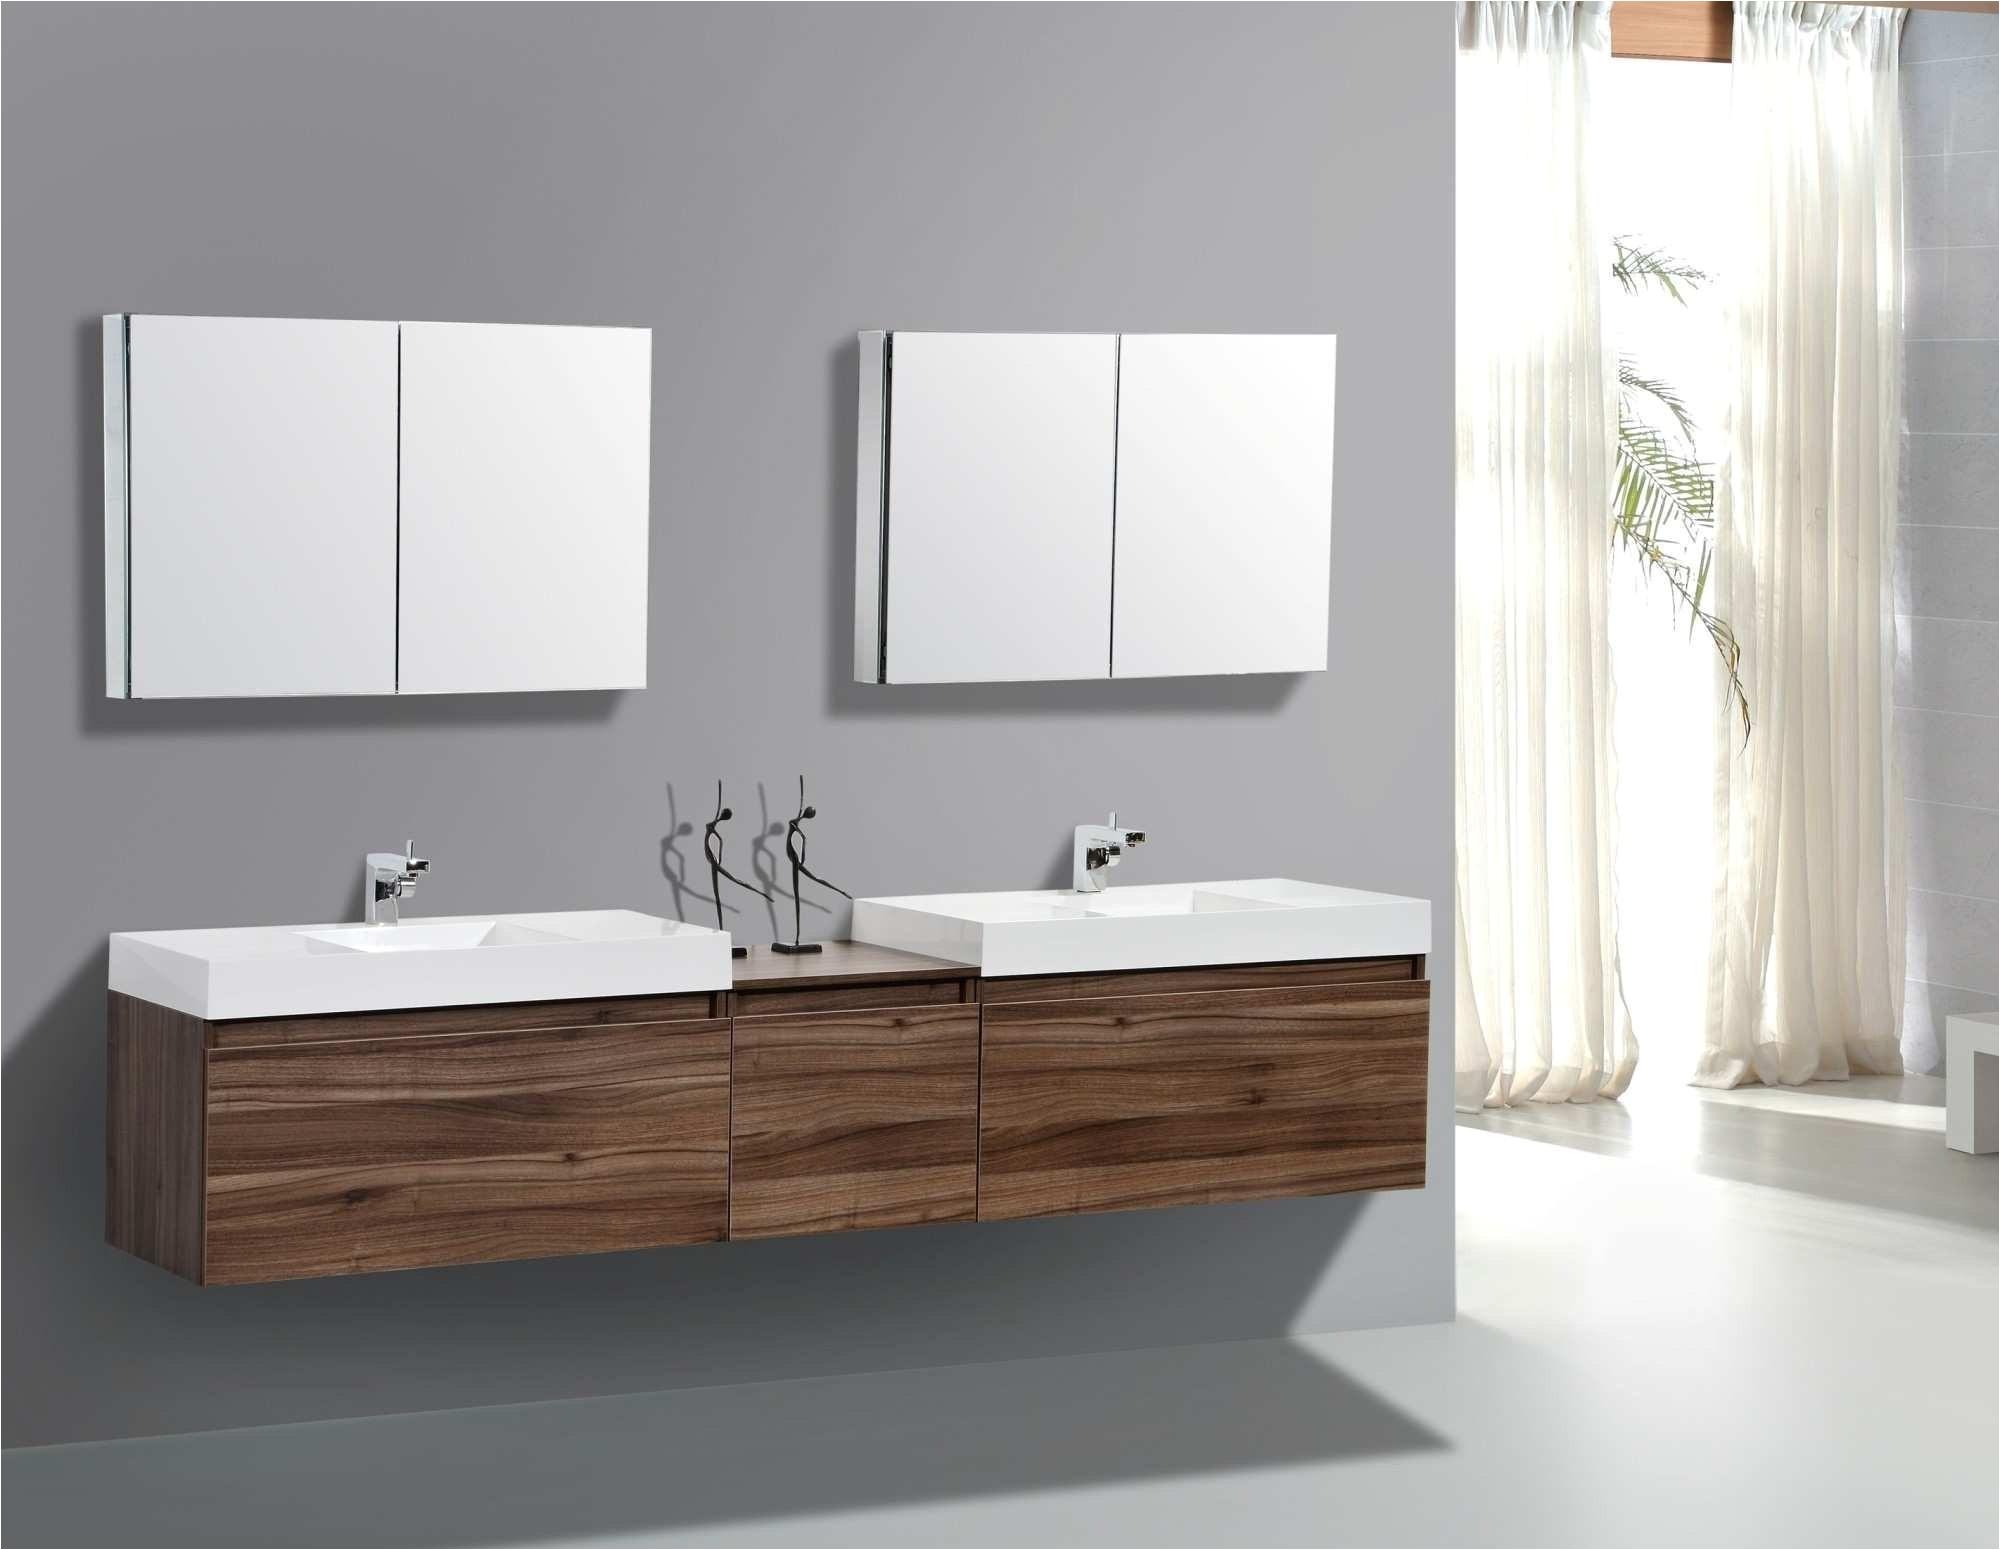 cool bathroom lights inspirational modern vanity bathroomh sink double bathroom vanitiyi 0d cool